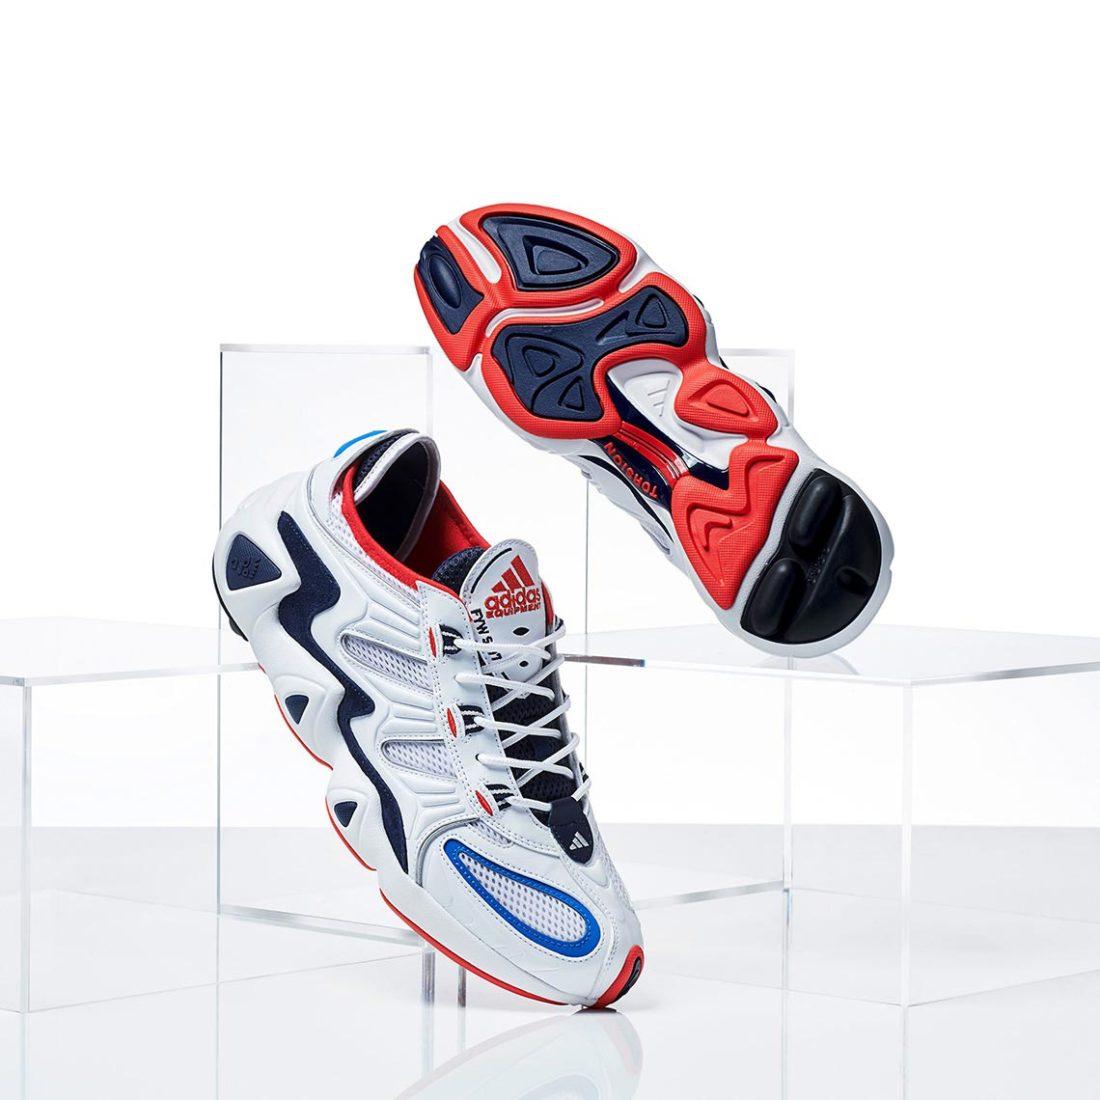 low priced 2b554 84b31 adidas-consortium-fyw-s-97-og-white-02